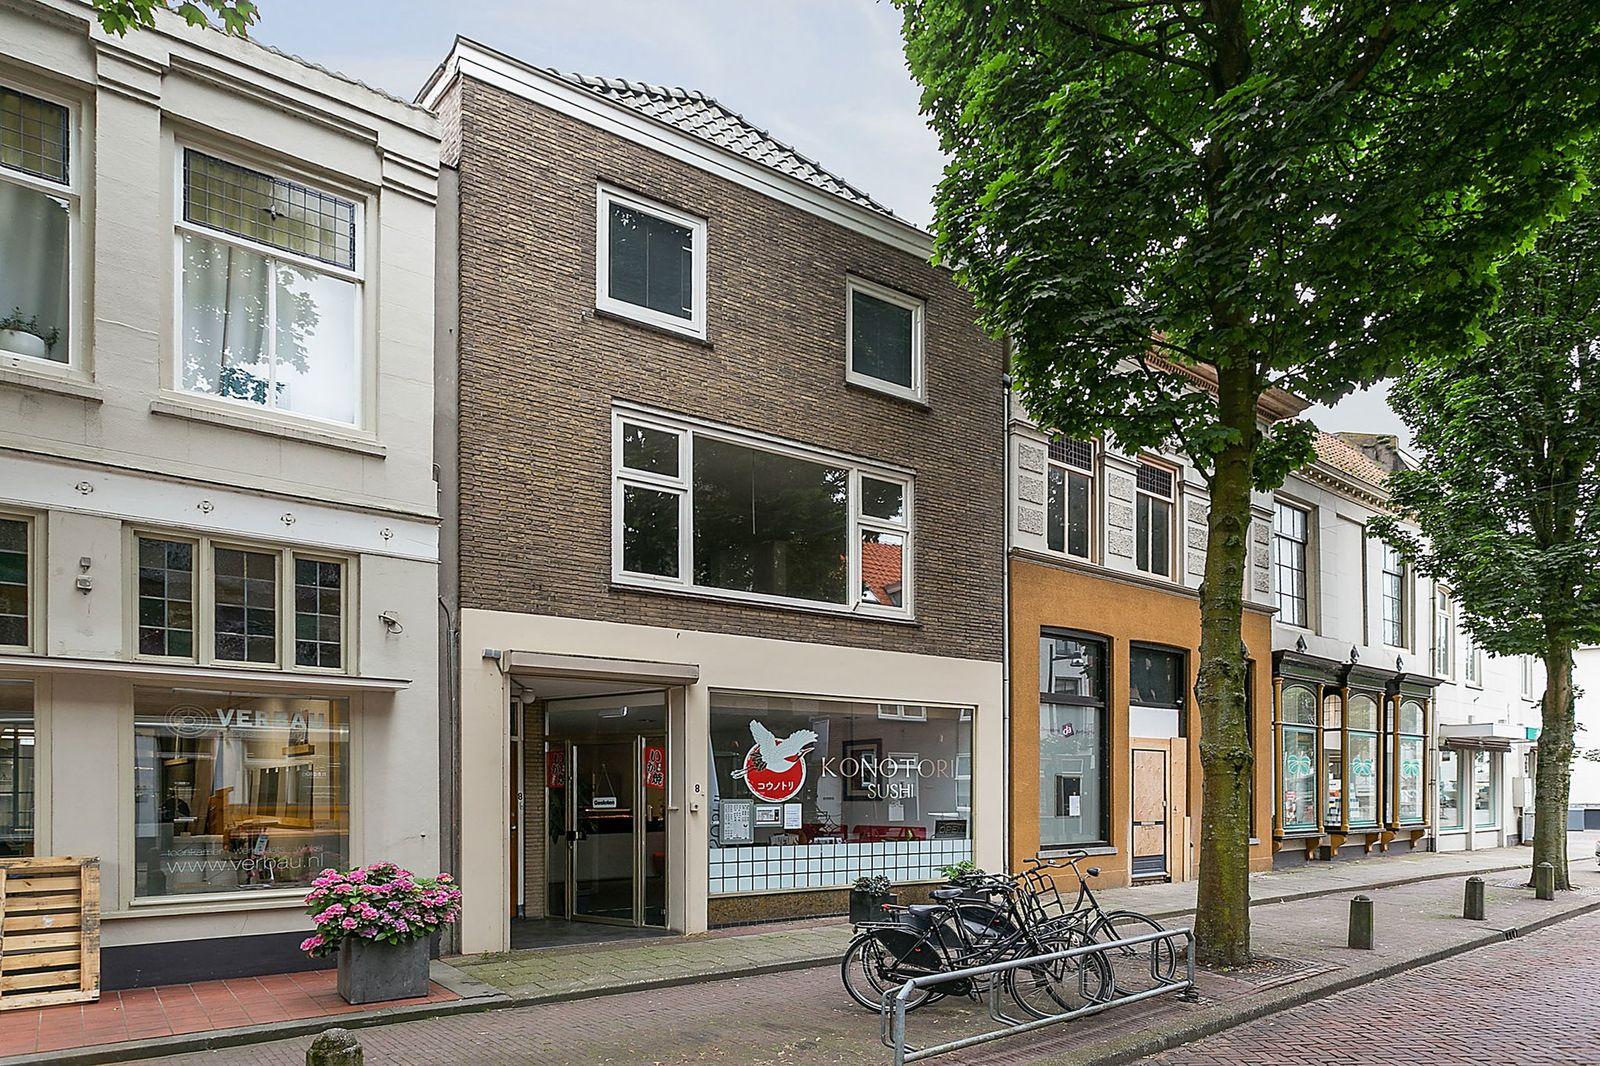 Gasthuisstraat 8, Zaltbommel